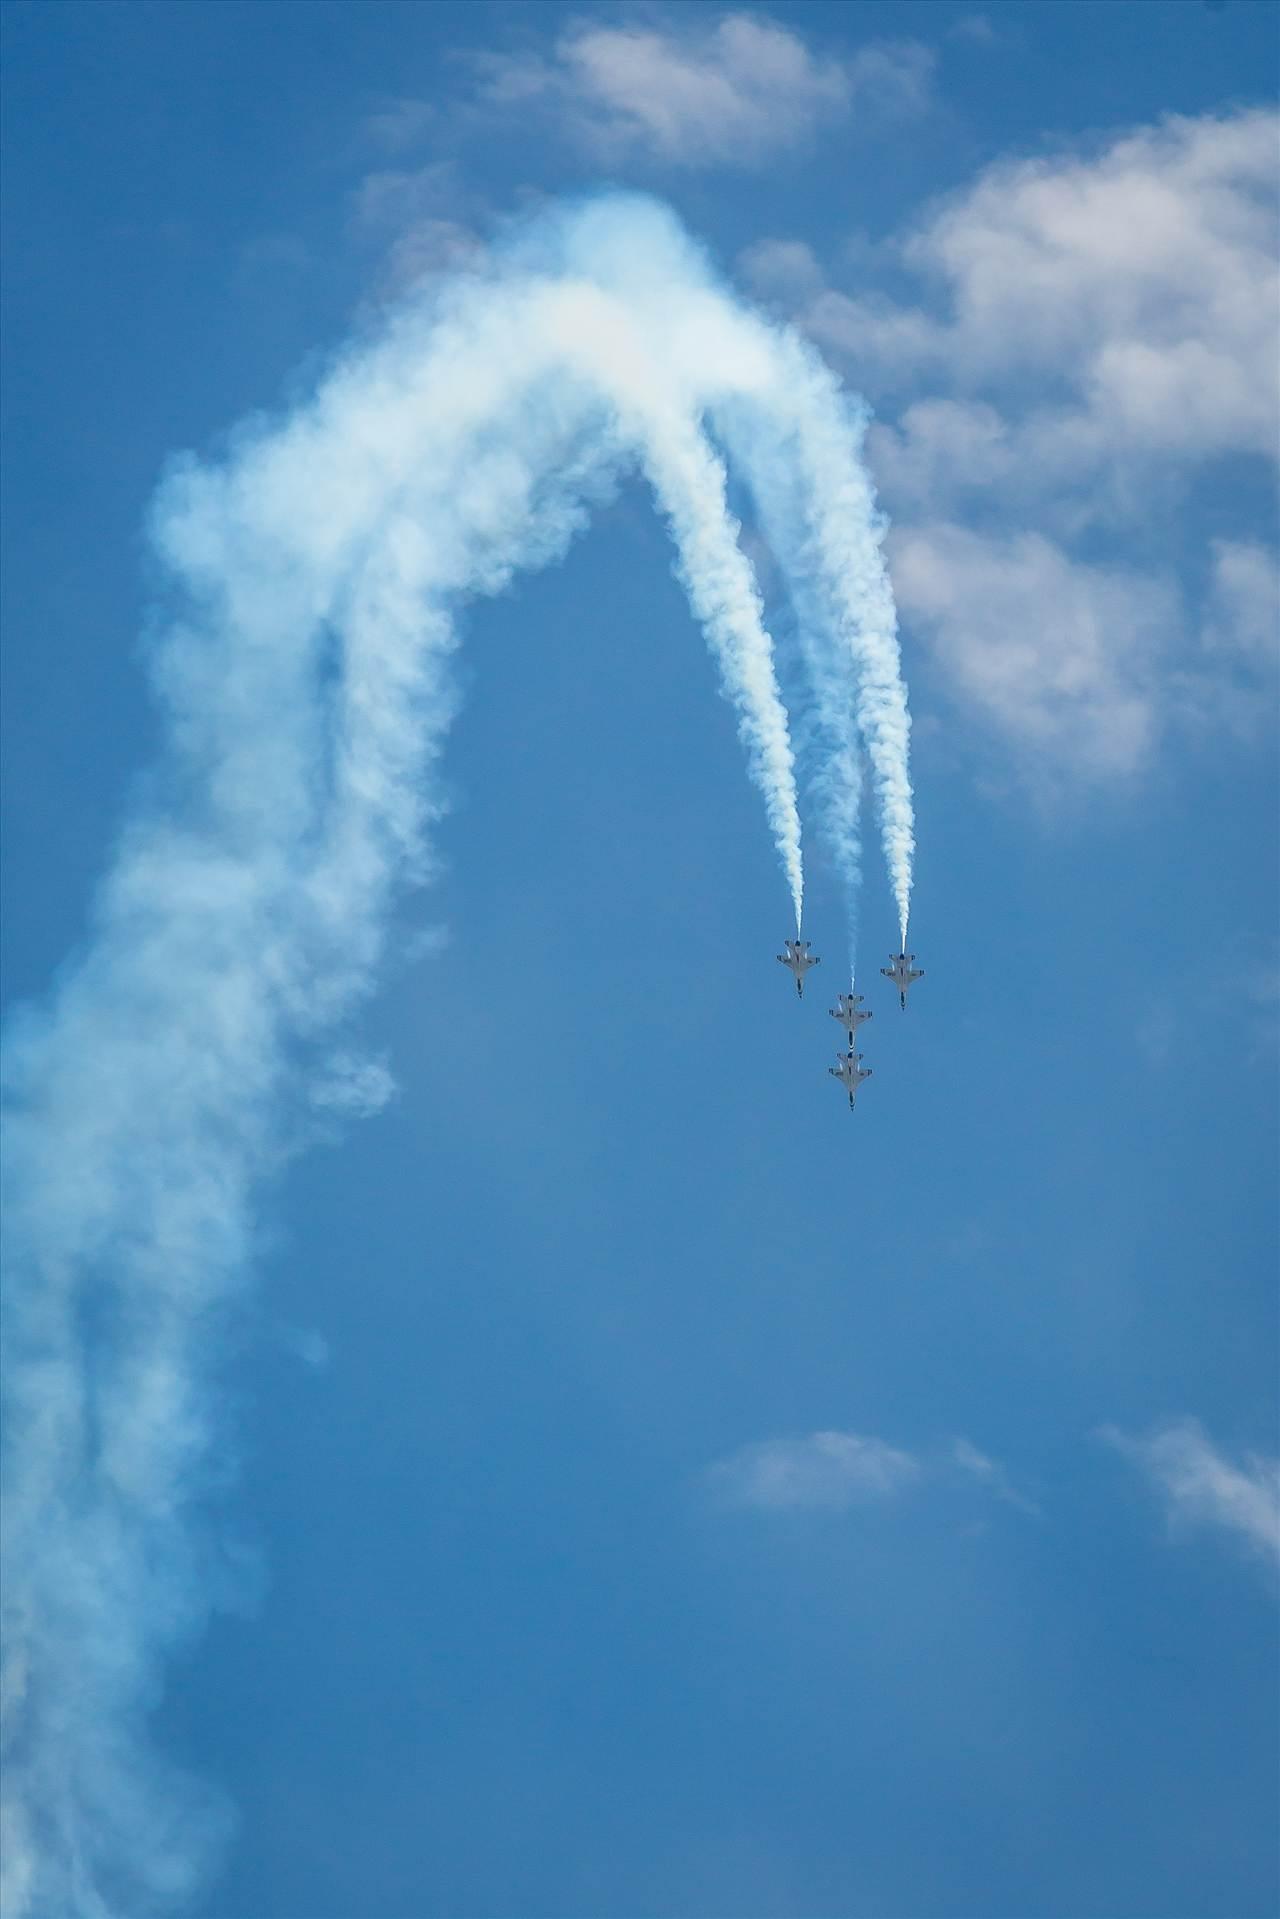 USAF Thunderbirds 20 -  by D Scott Smith